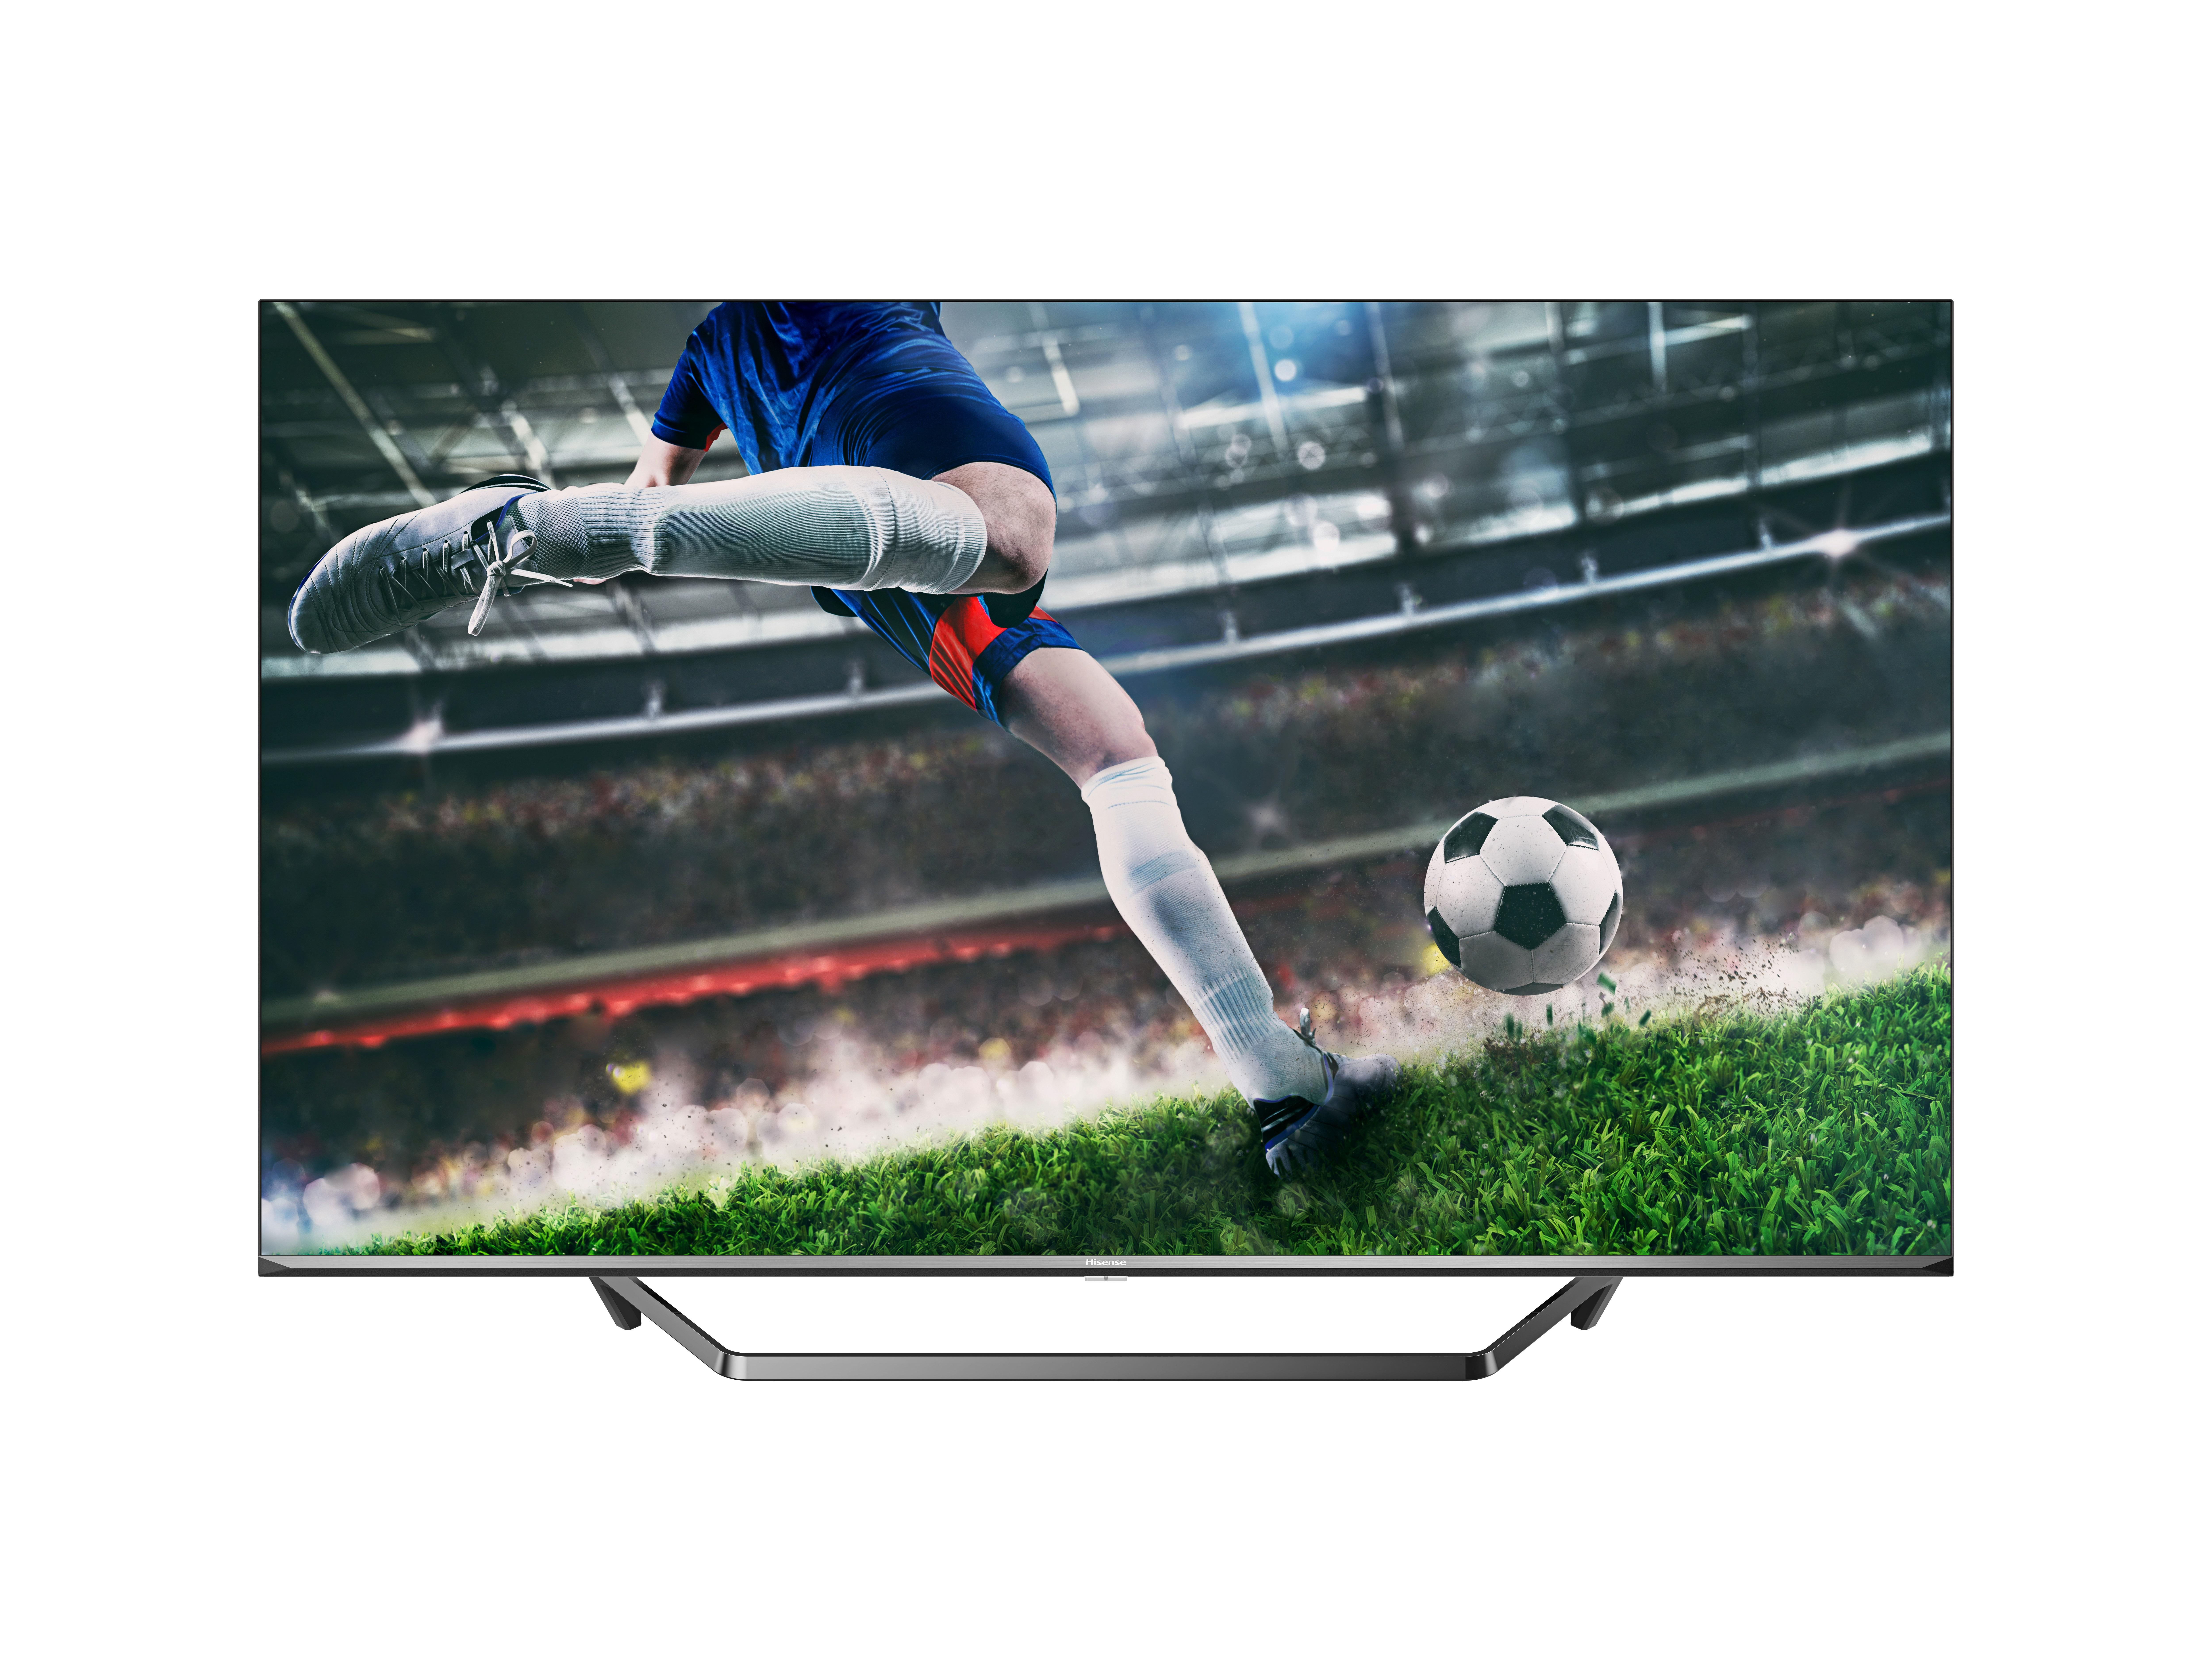 Hisense U7QF 50U7QF TV 127 cm (50